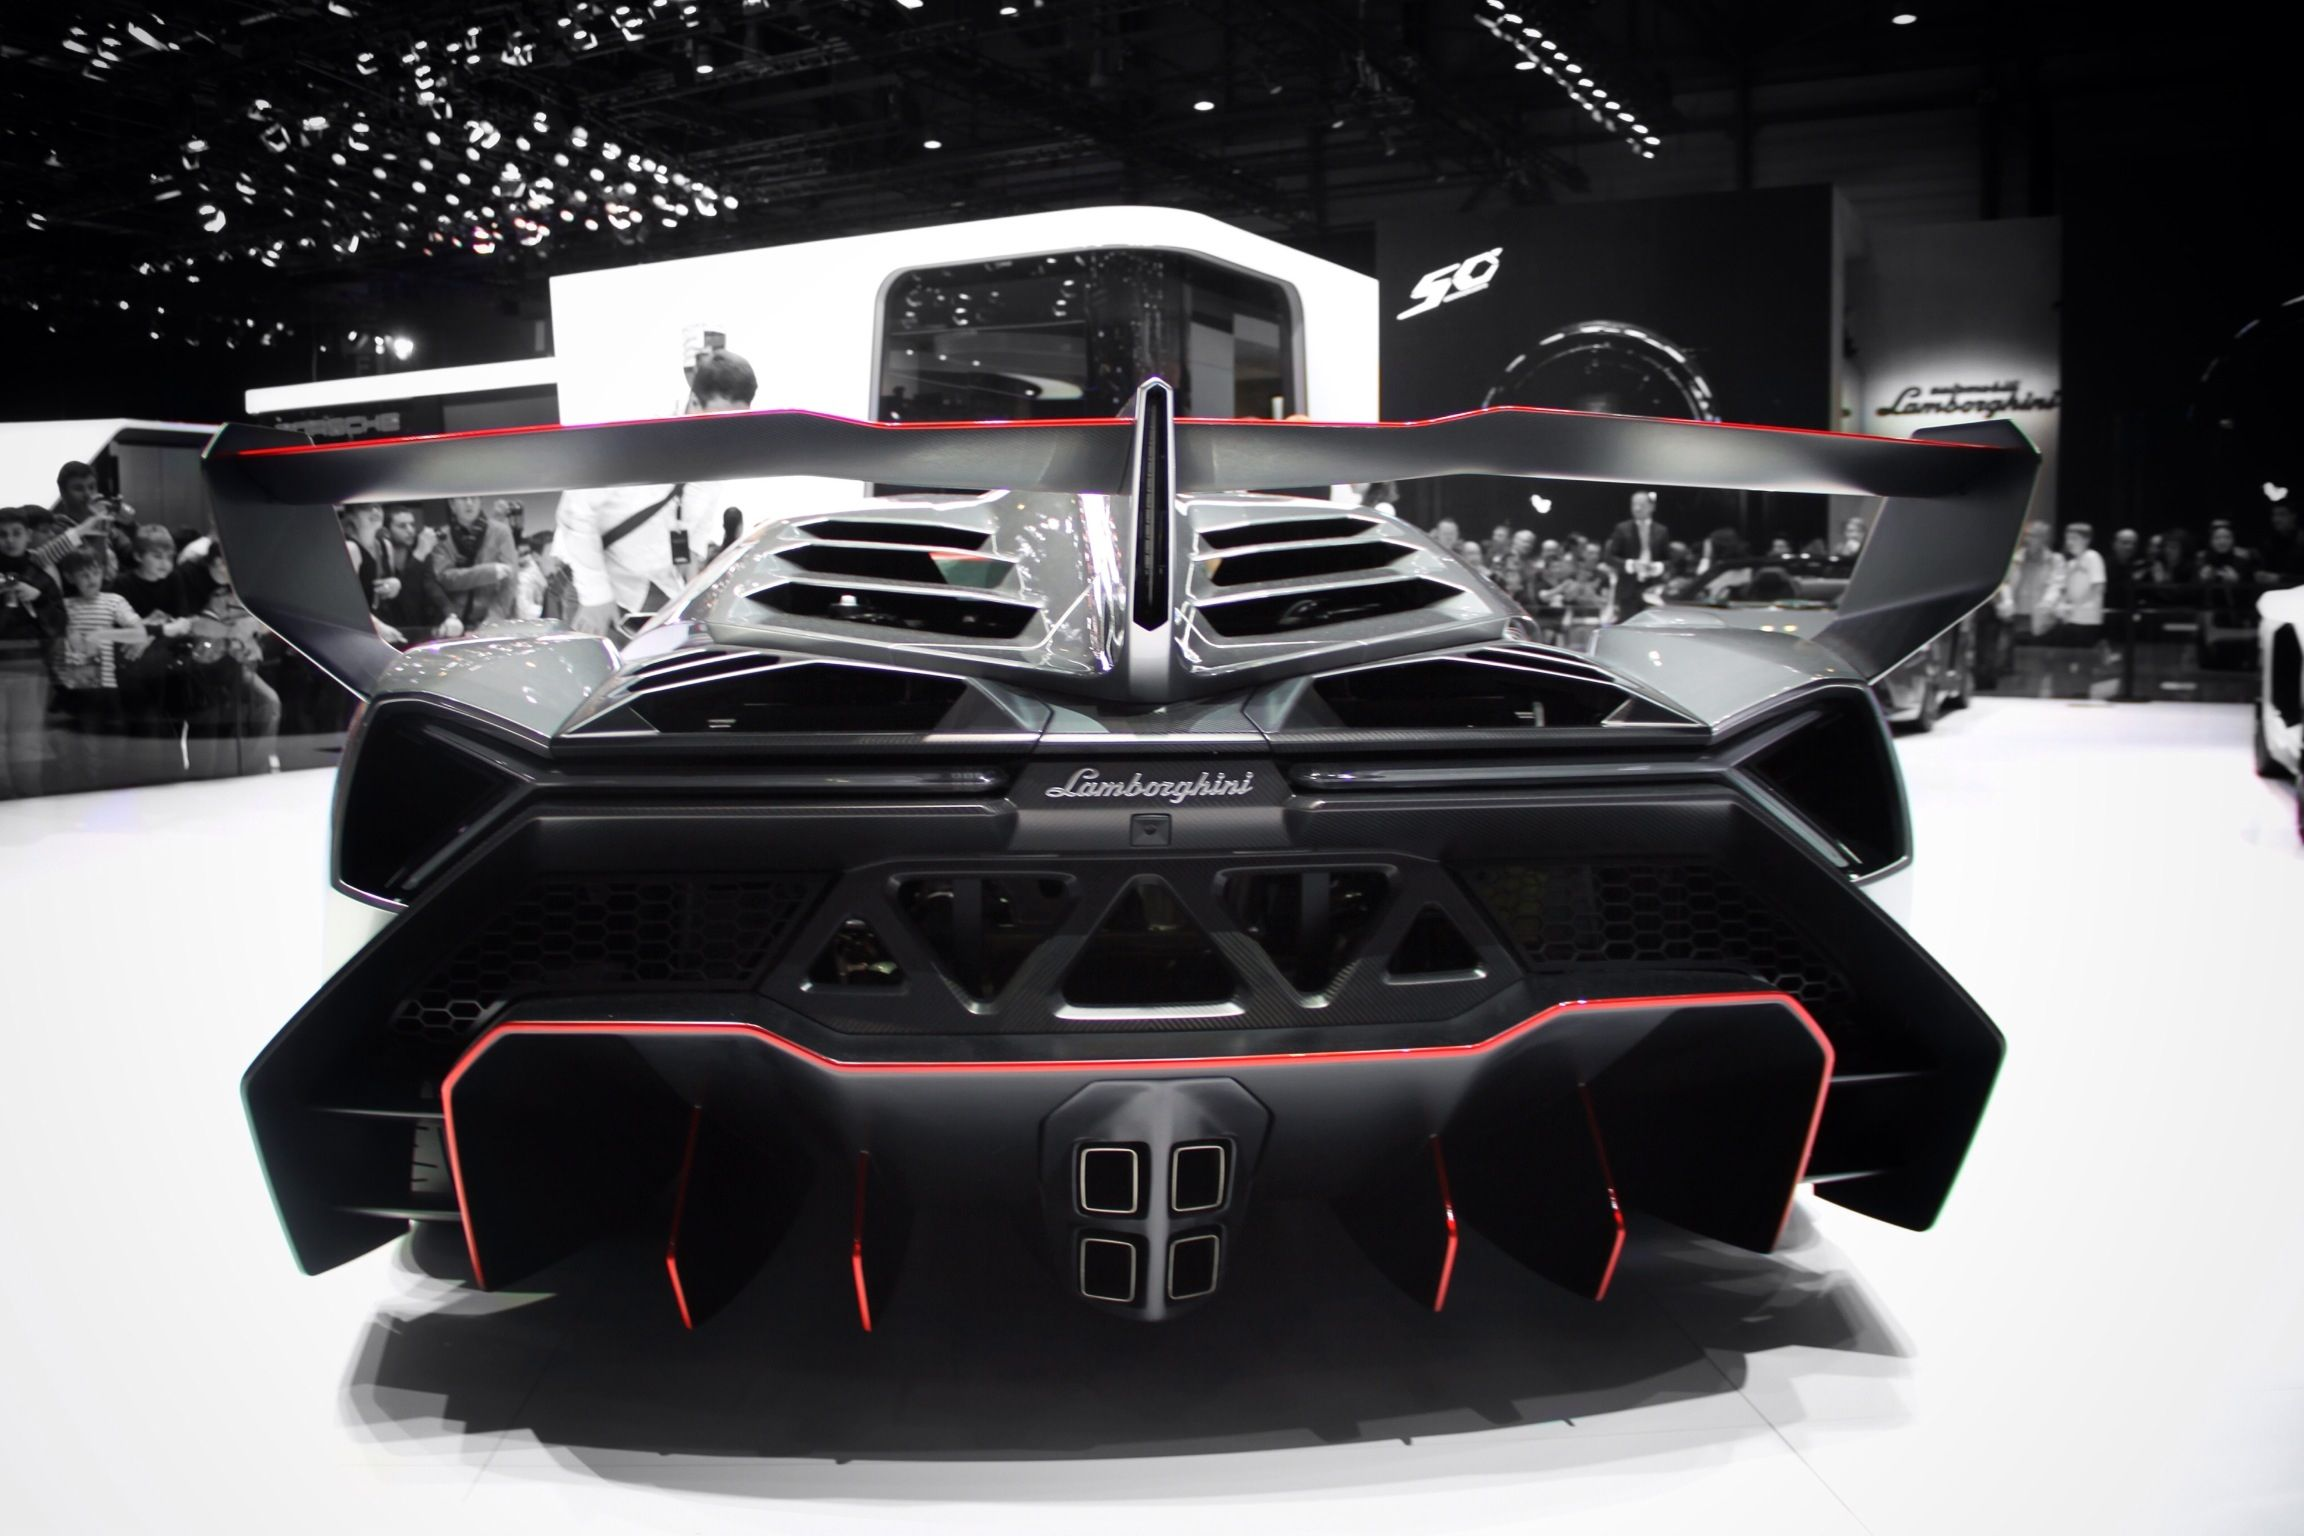 bb6a4a06b6e8d9b2e9571cb16c8ebdf2 Stunning Ficha Tecnica Porsche 918 Spyder Concept Cars Trend